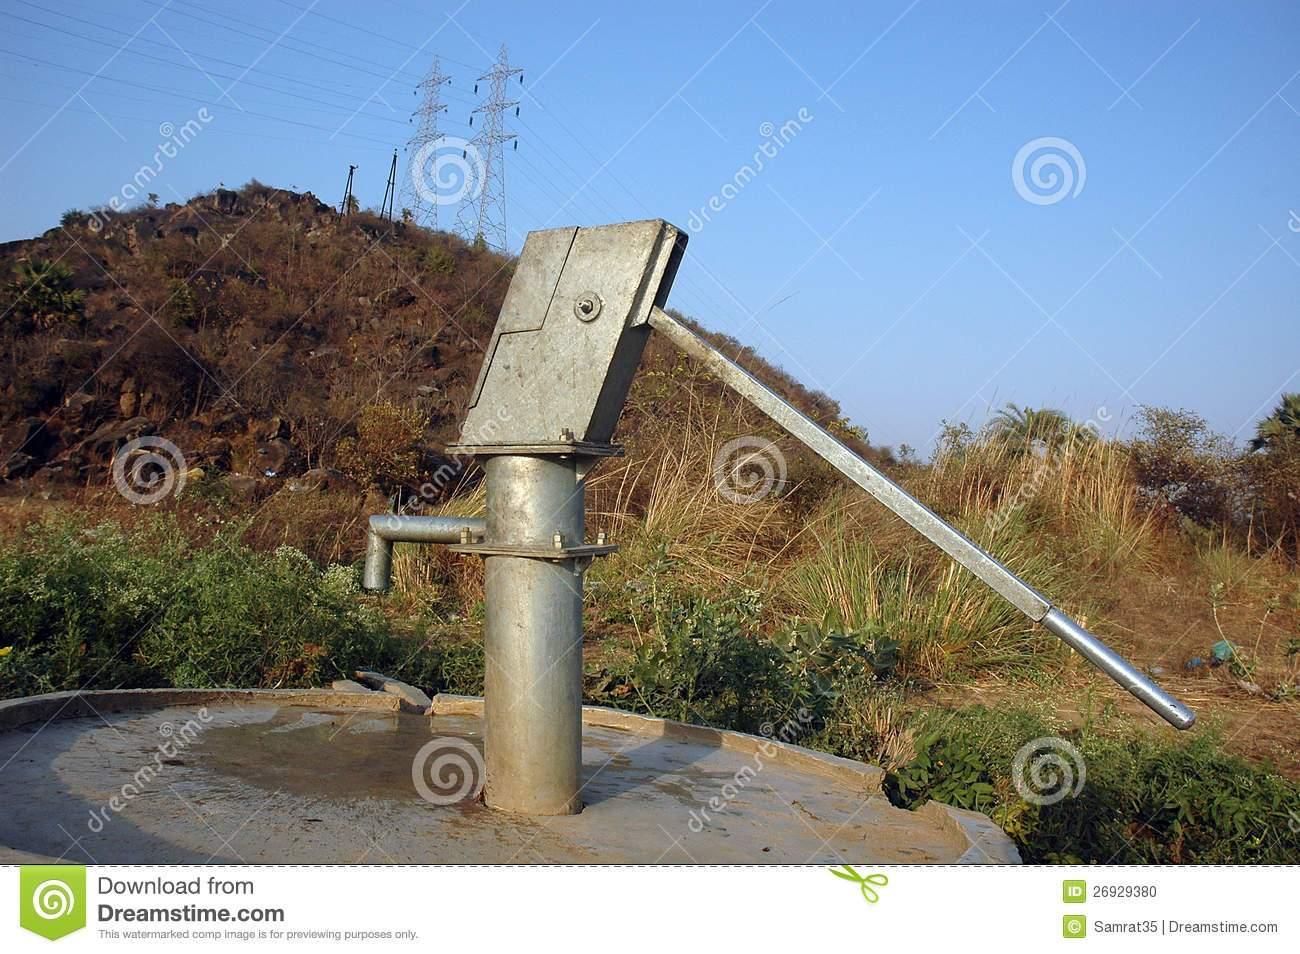 Tubewell clipart 6 » Clipart Portal.